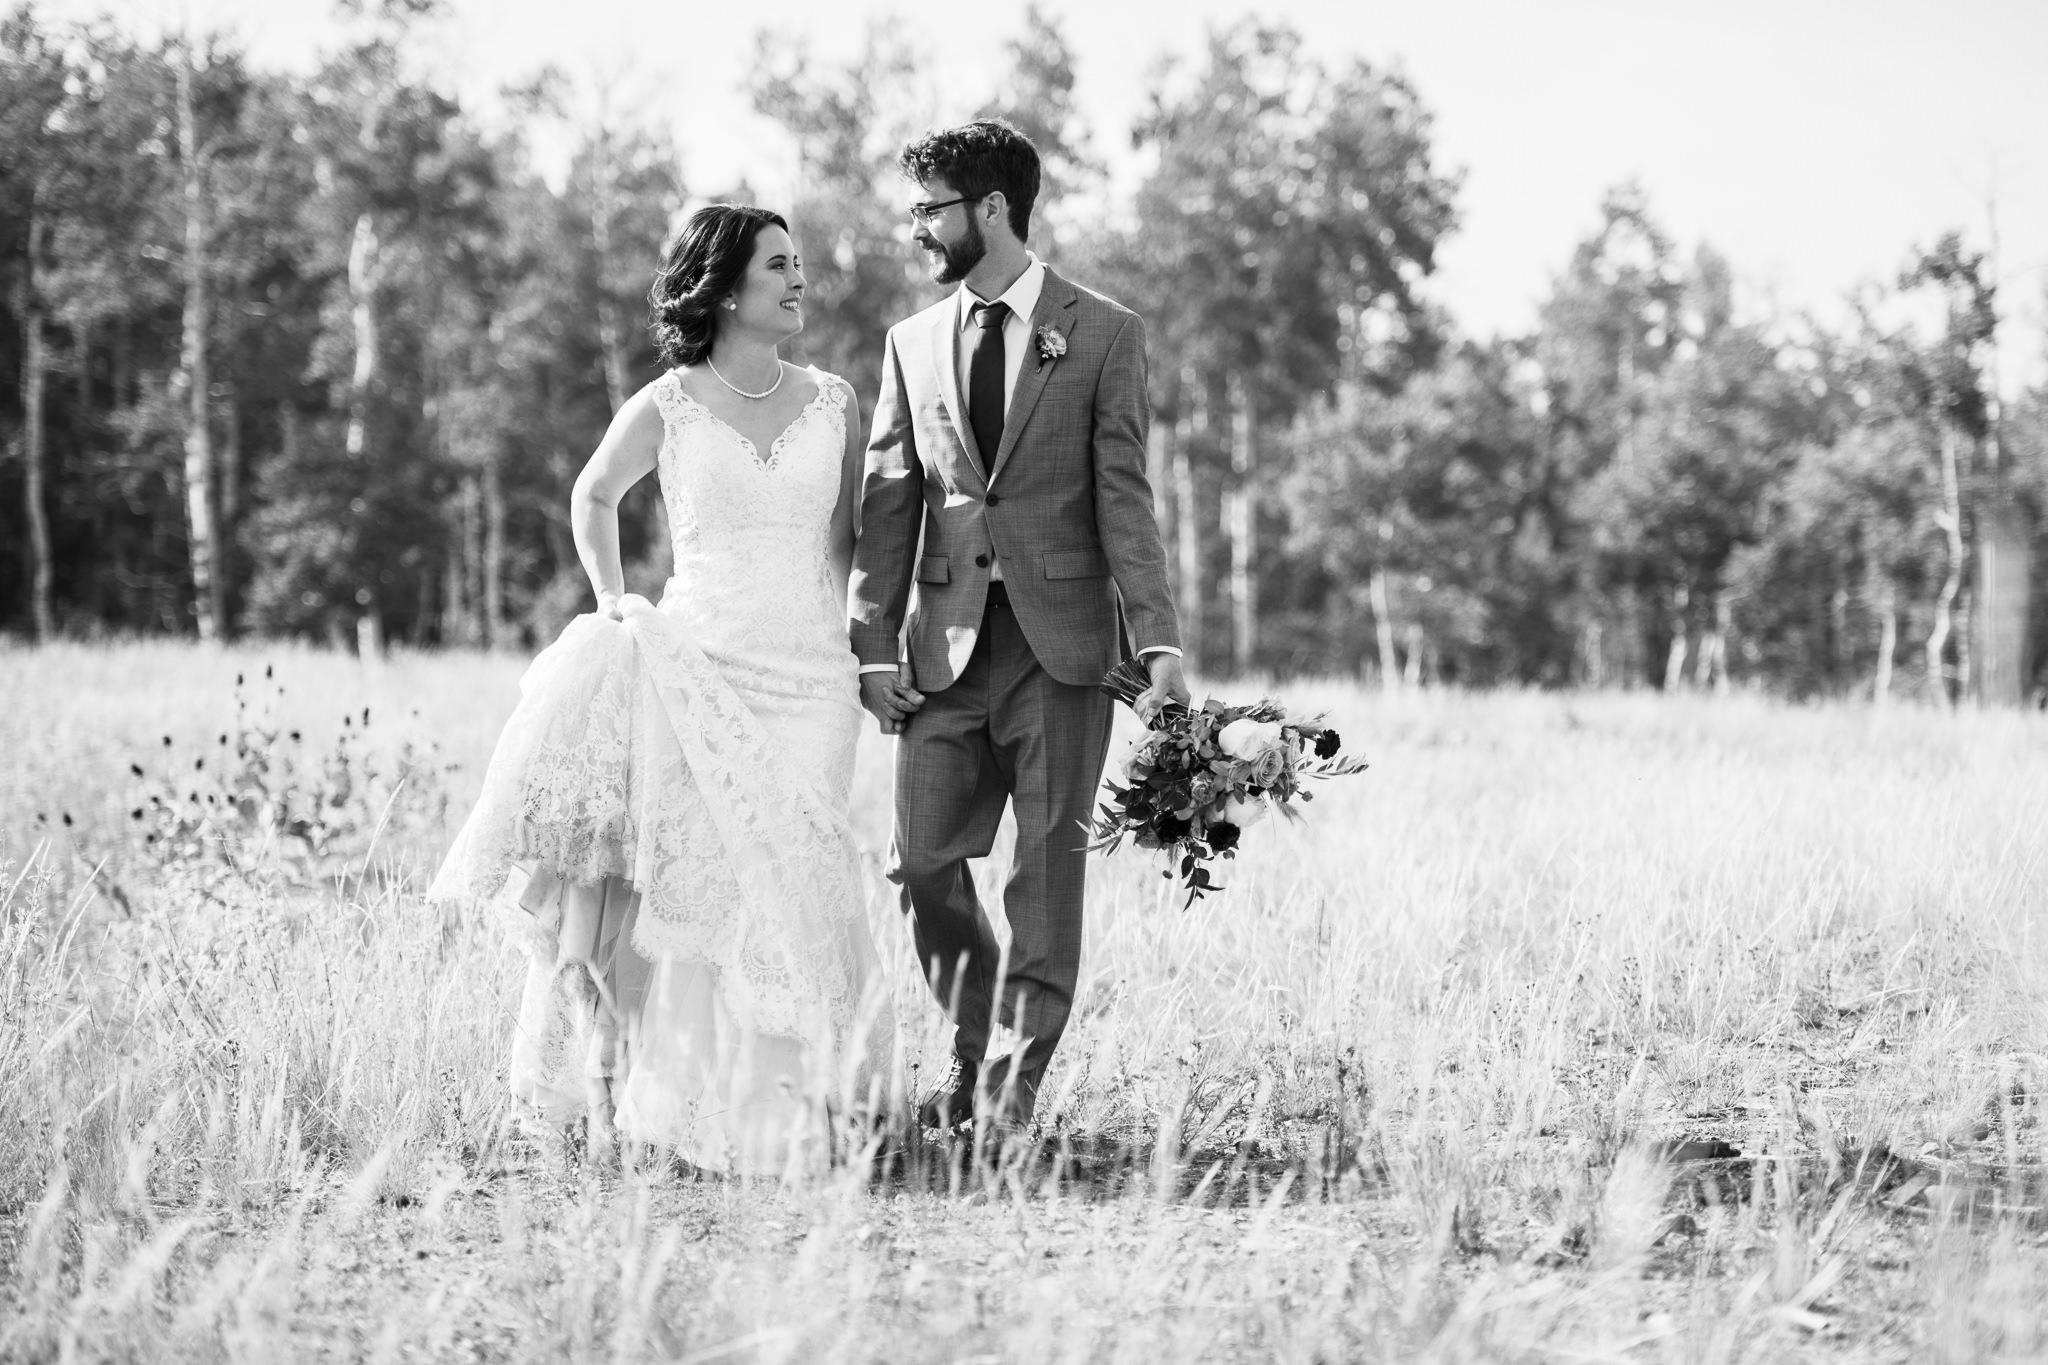 353_ONL_Kat_Nick_Wedding_Trevor_Hooper_Photo.jpg